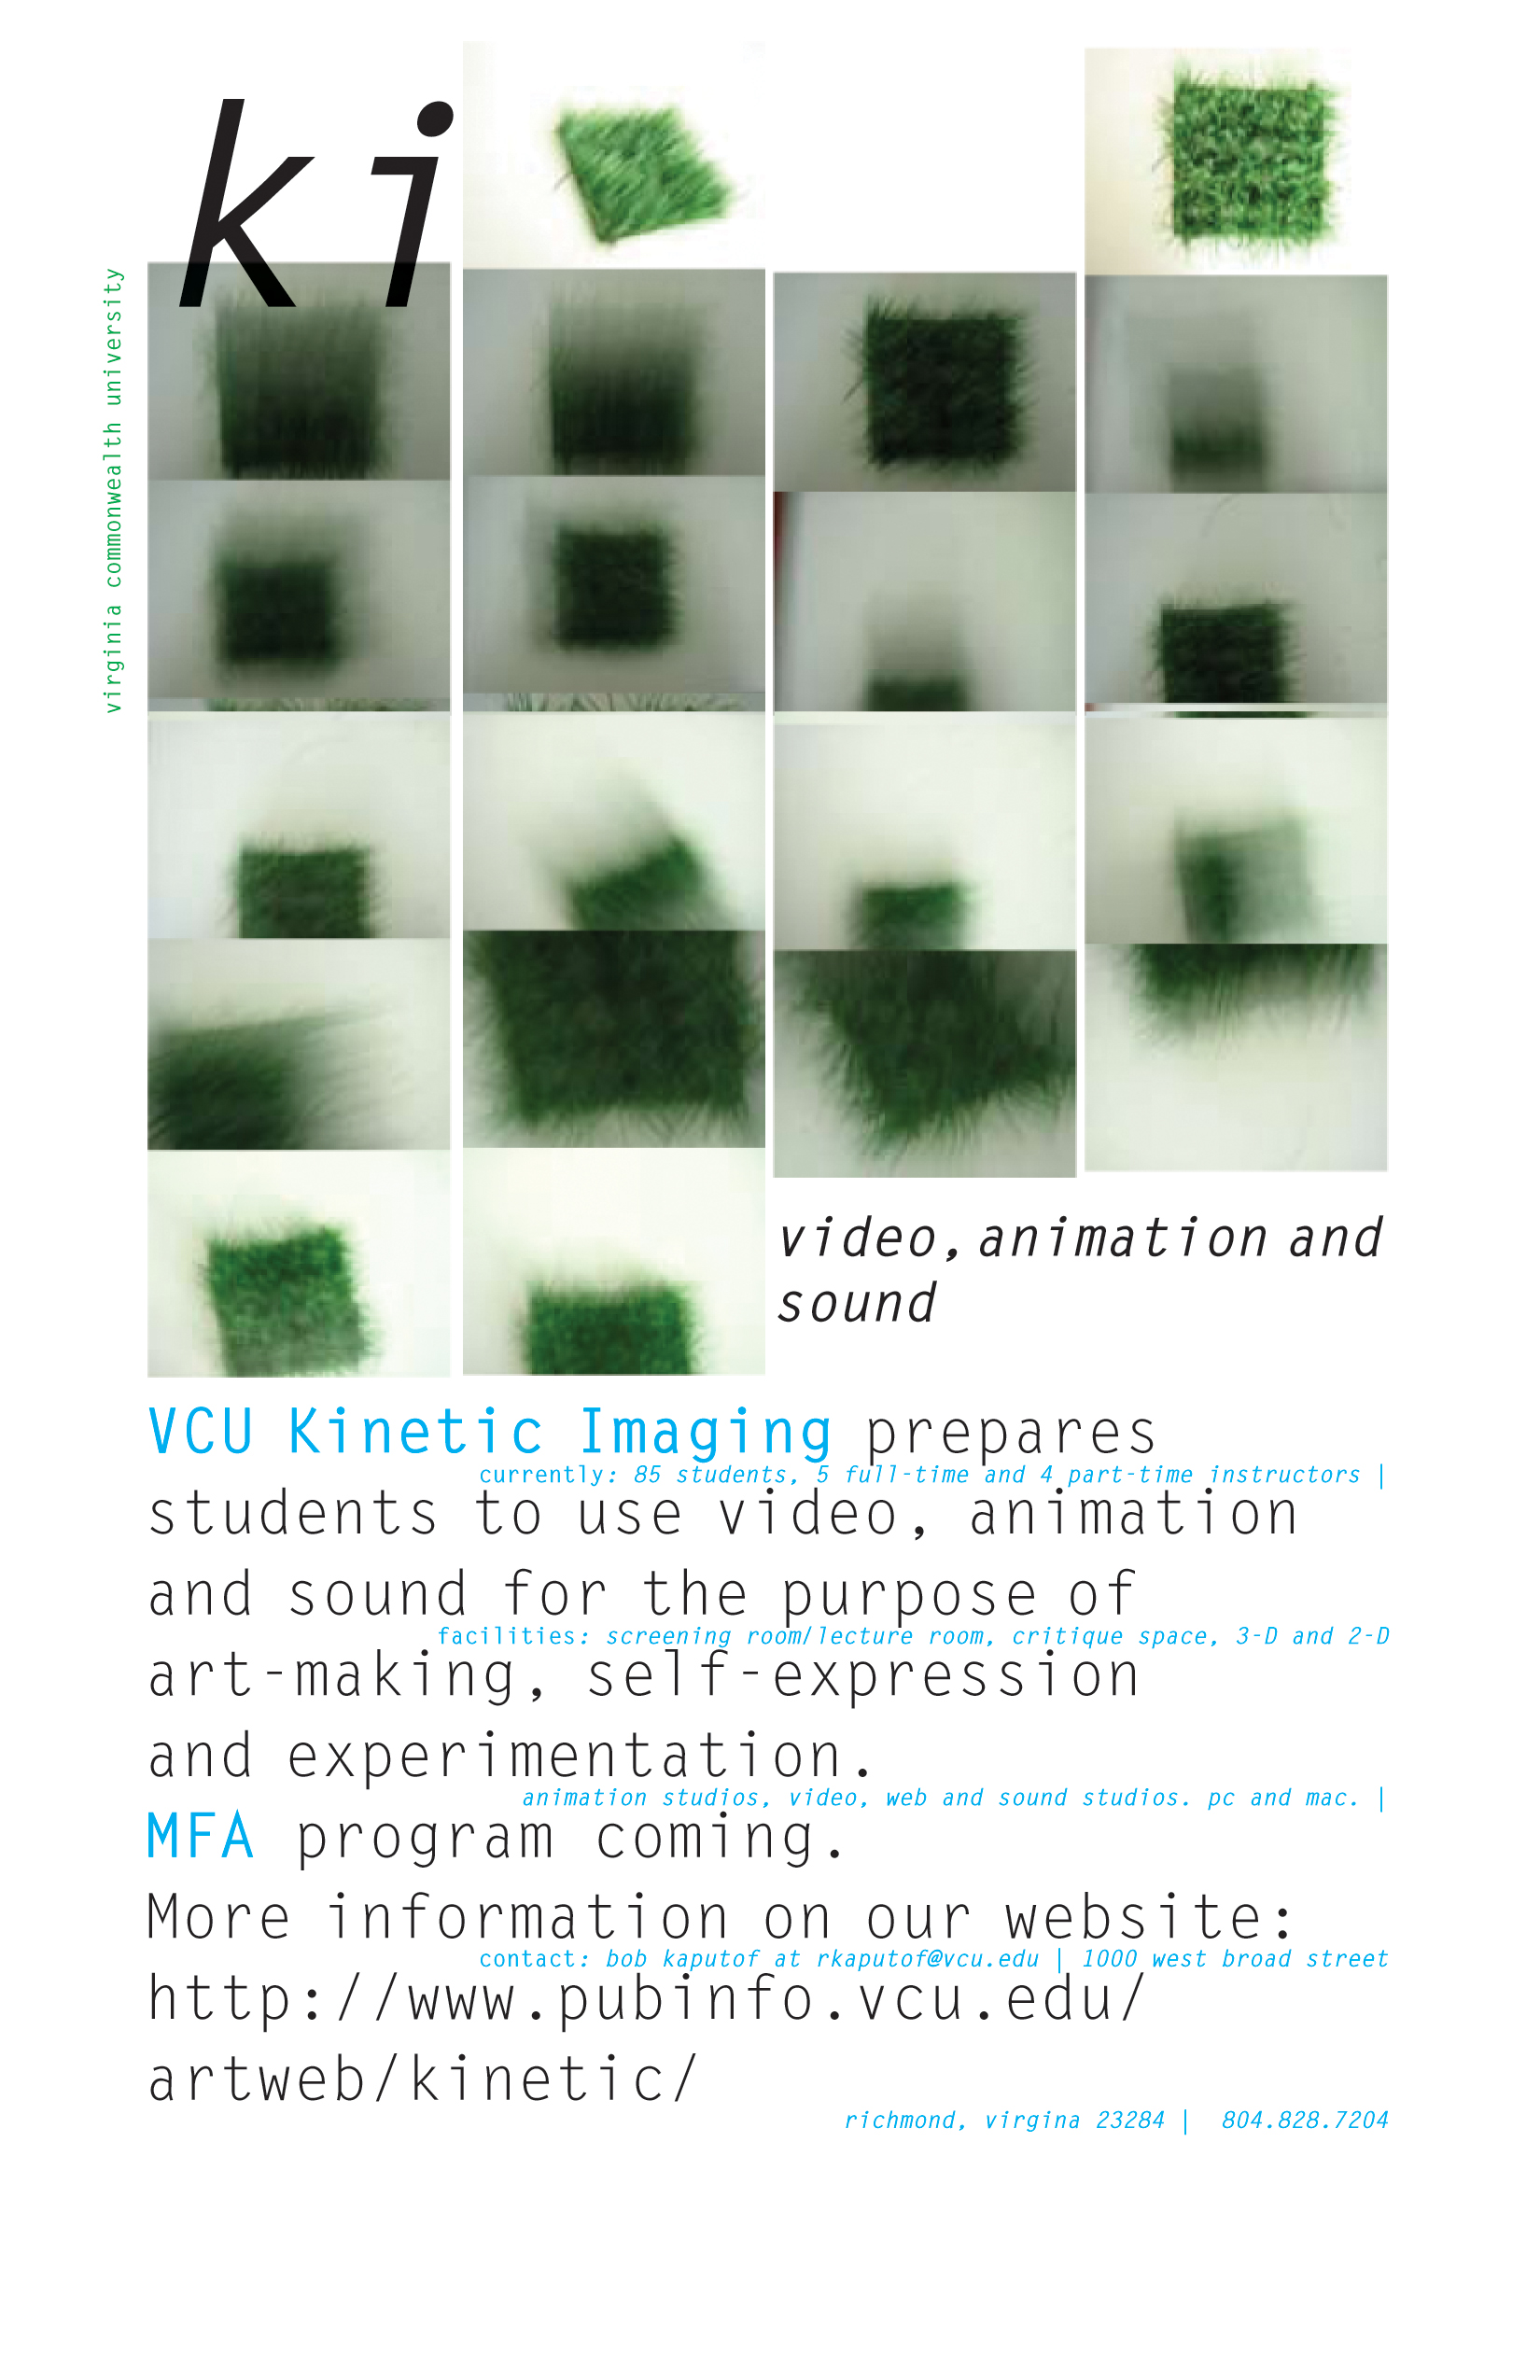 VCUArts Kinetic Imaging